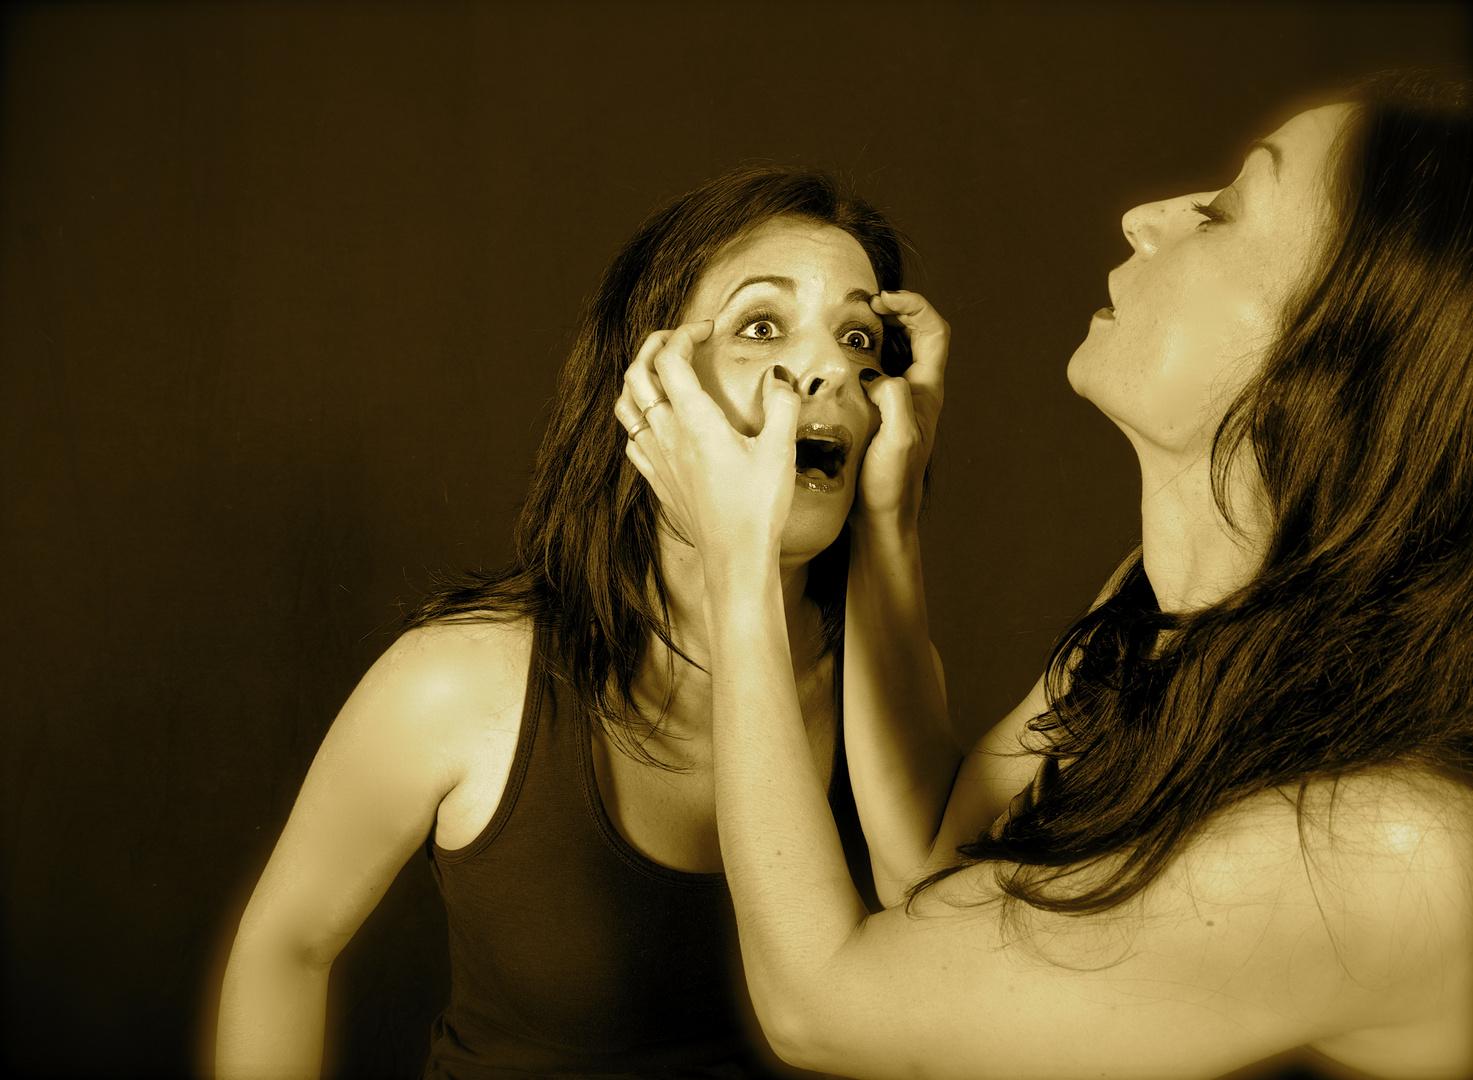 SERIE: Ira,Envidia, soberbia y otras virtudes femeninas....